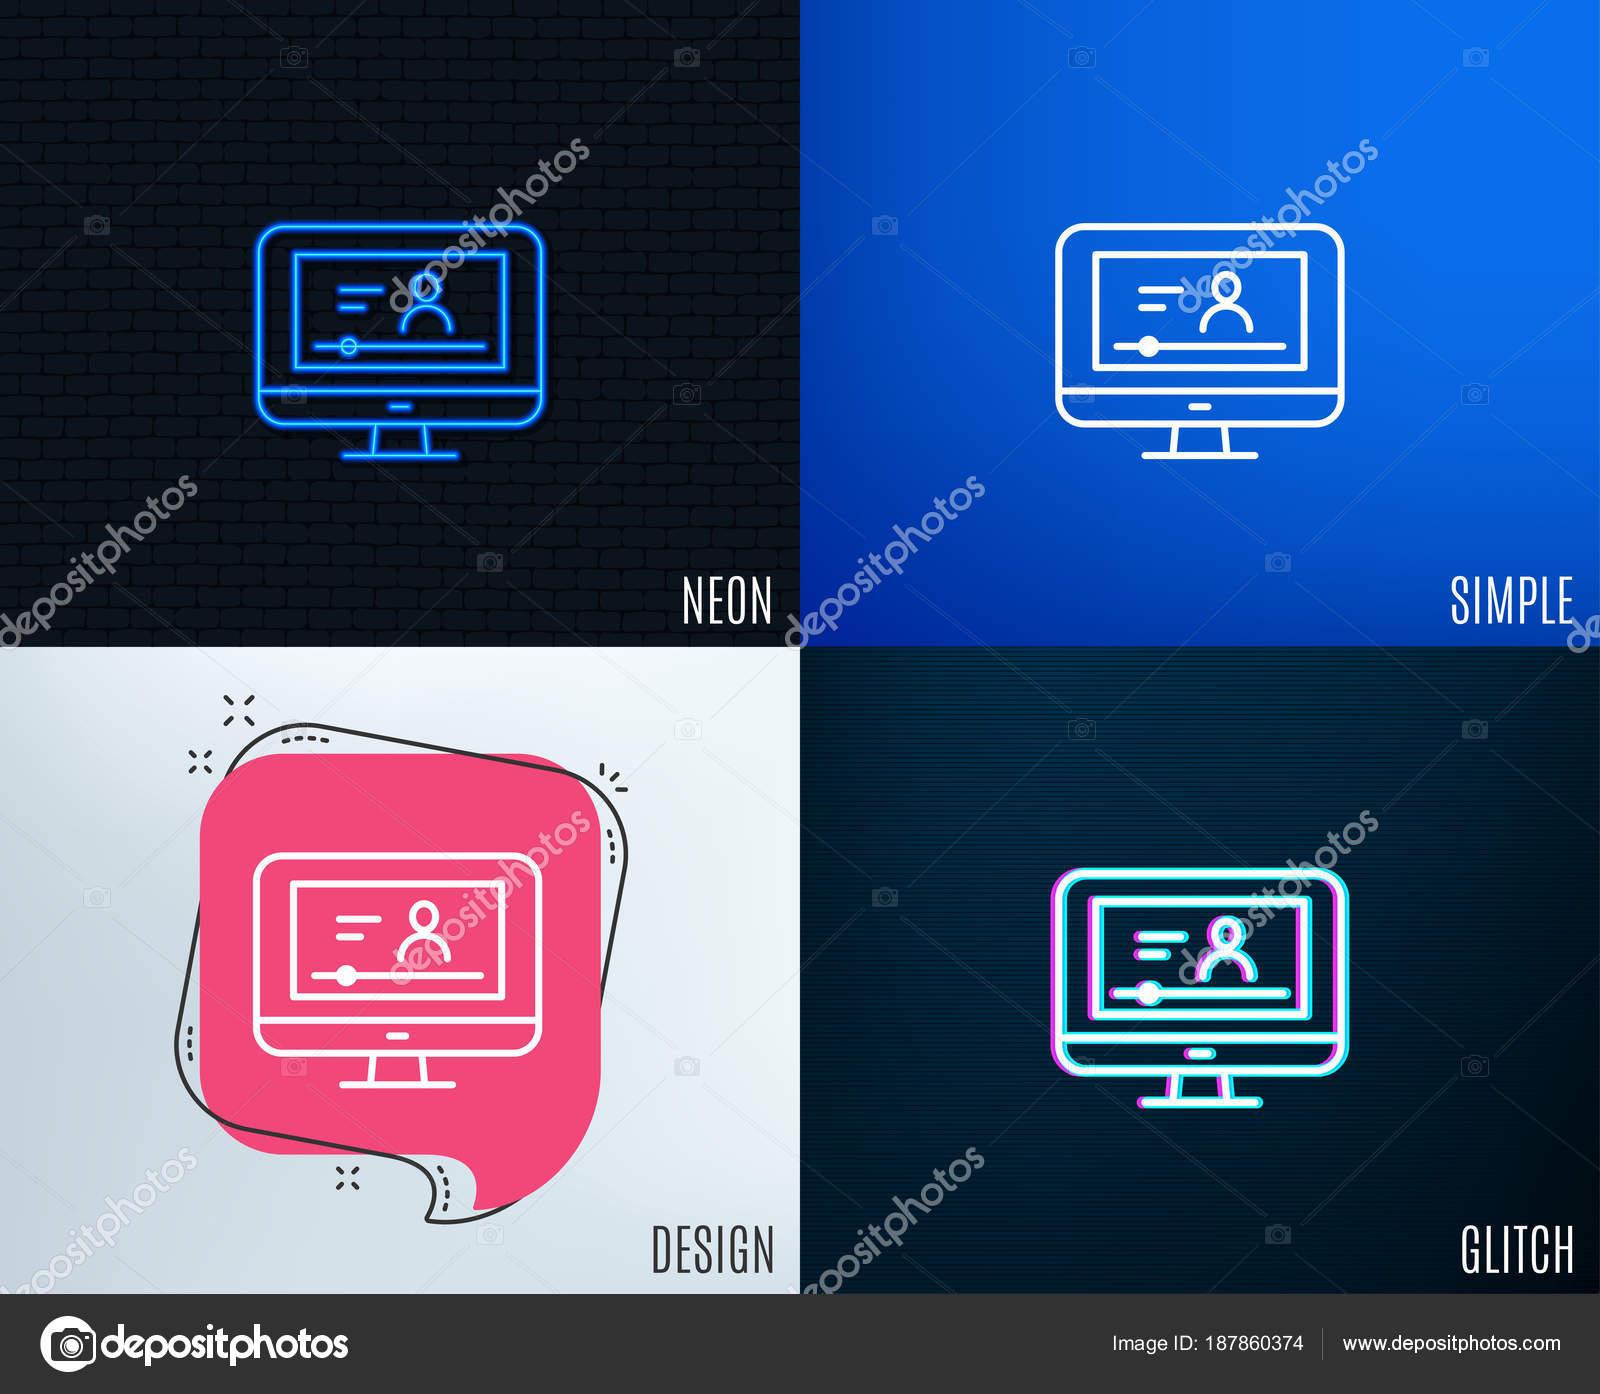 Glitch Neon Effect Online Video Education Line Icon Computer Online